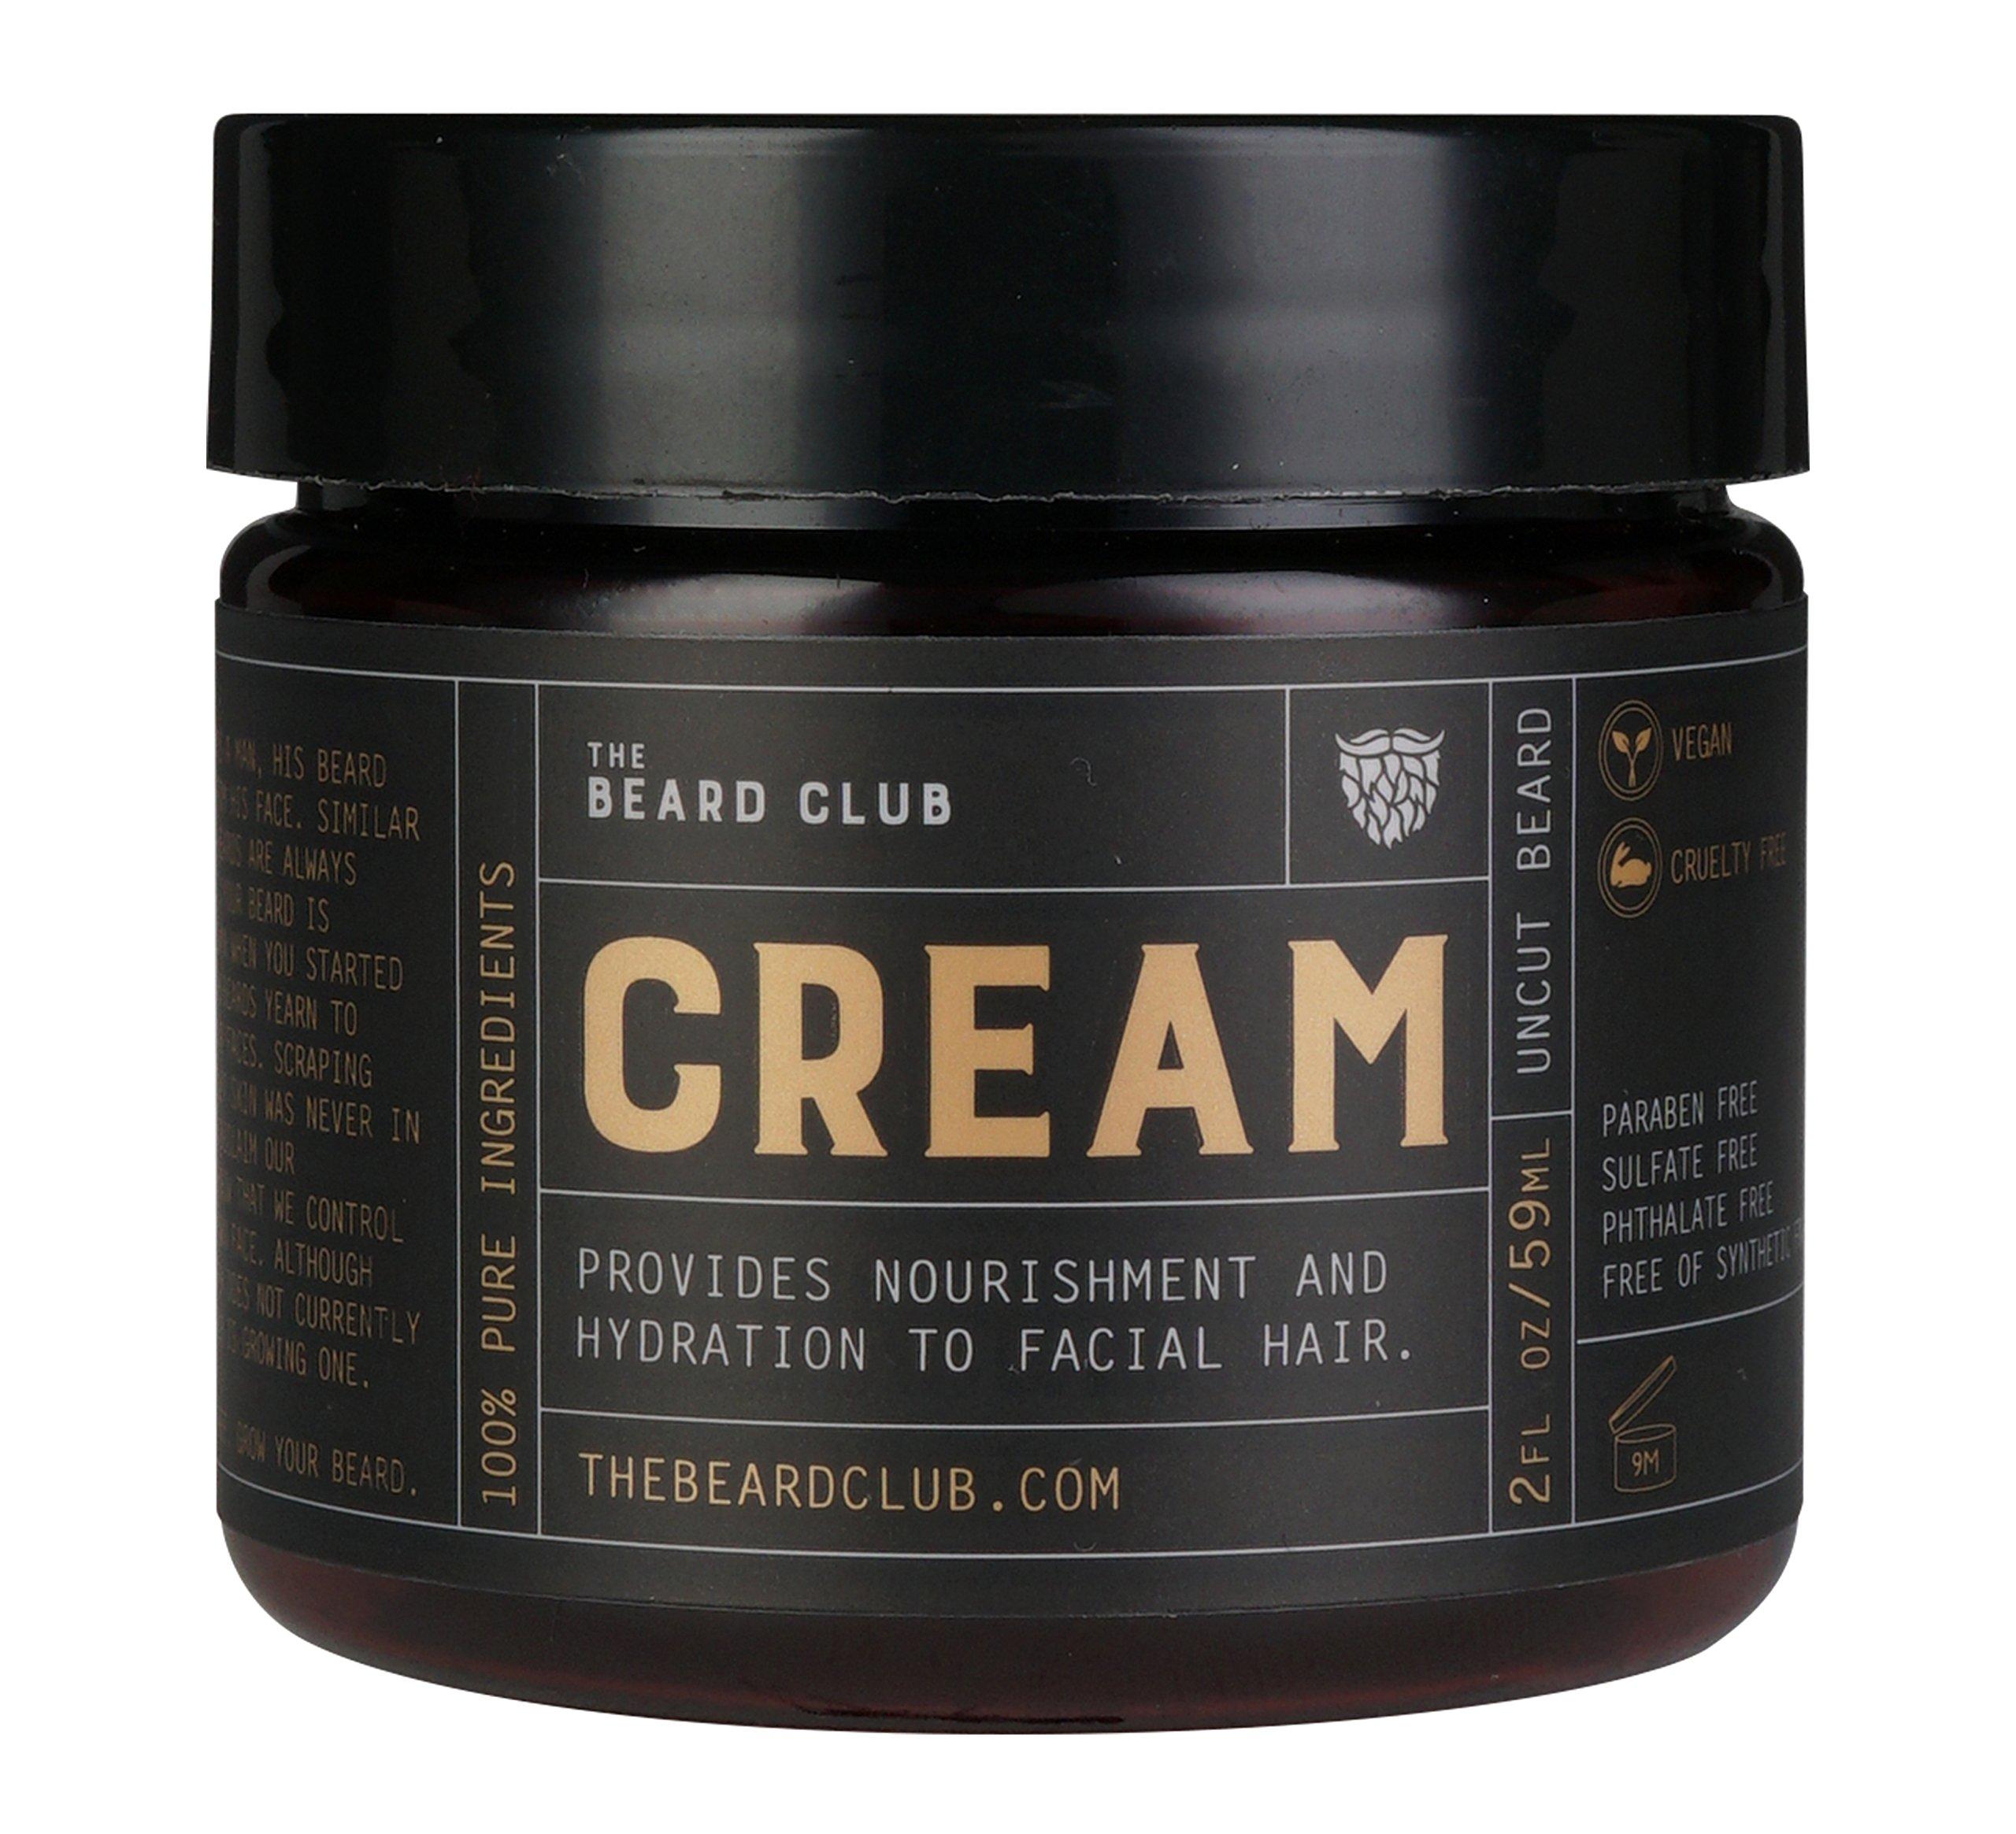 Original Beard Cream | The Beard Club | Moisturizing and Hydrating | Healthier Facial Hair &